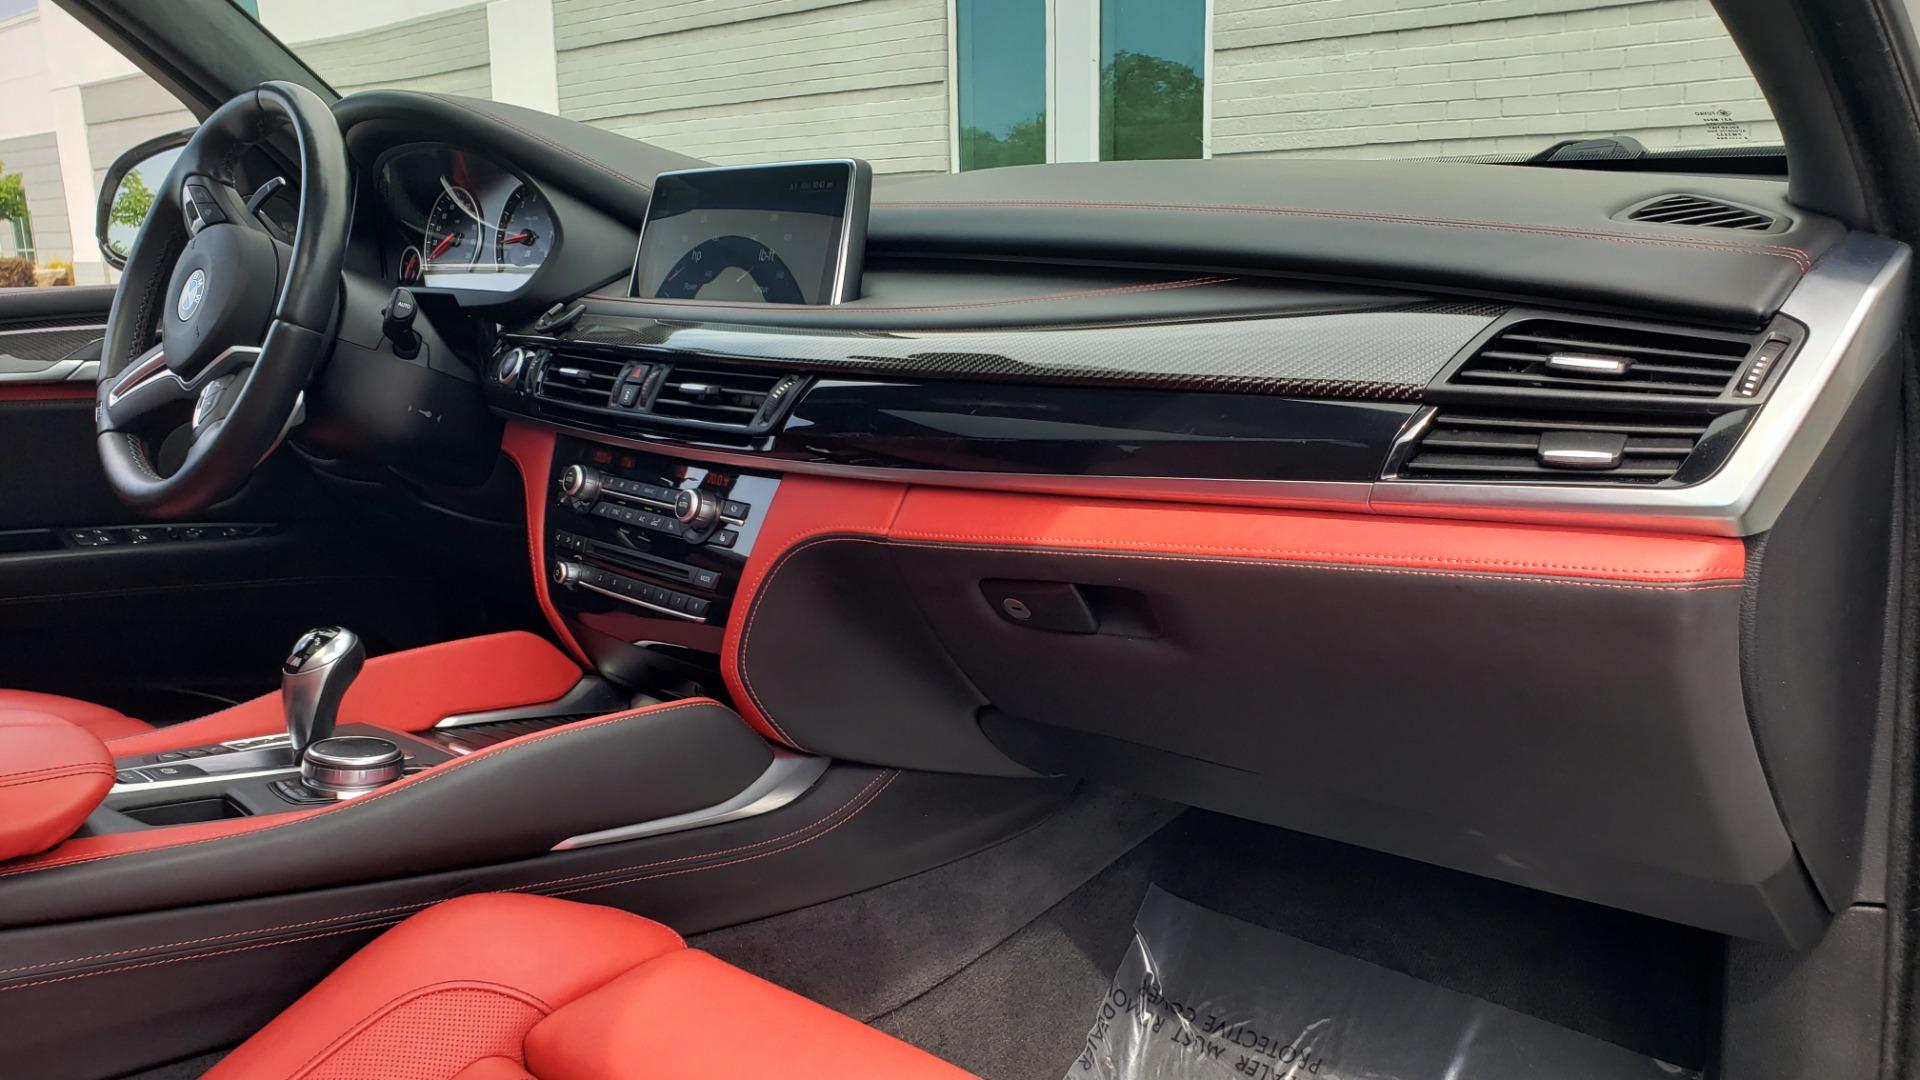 Used 2017 BMW X5 M EXECUTIVE PKG / NAV / DRVR ASST / BSM / HUD / HTD STS / WIFI for sale Sold at Formula Imports in Charlotte NC 28227 73